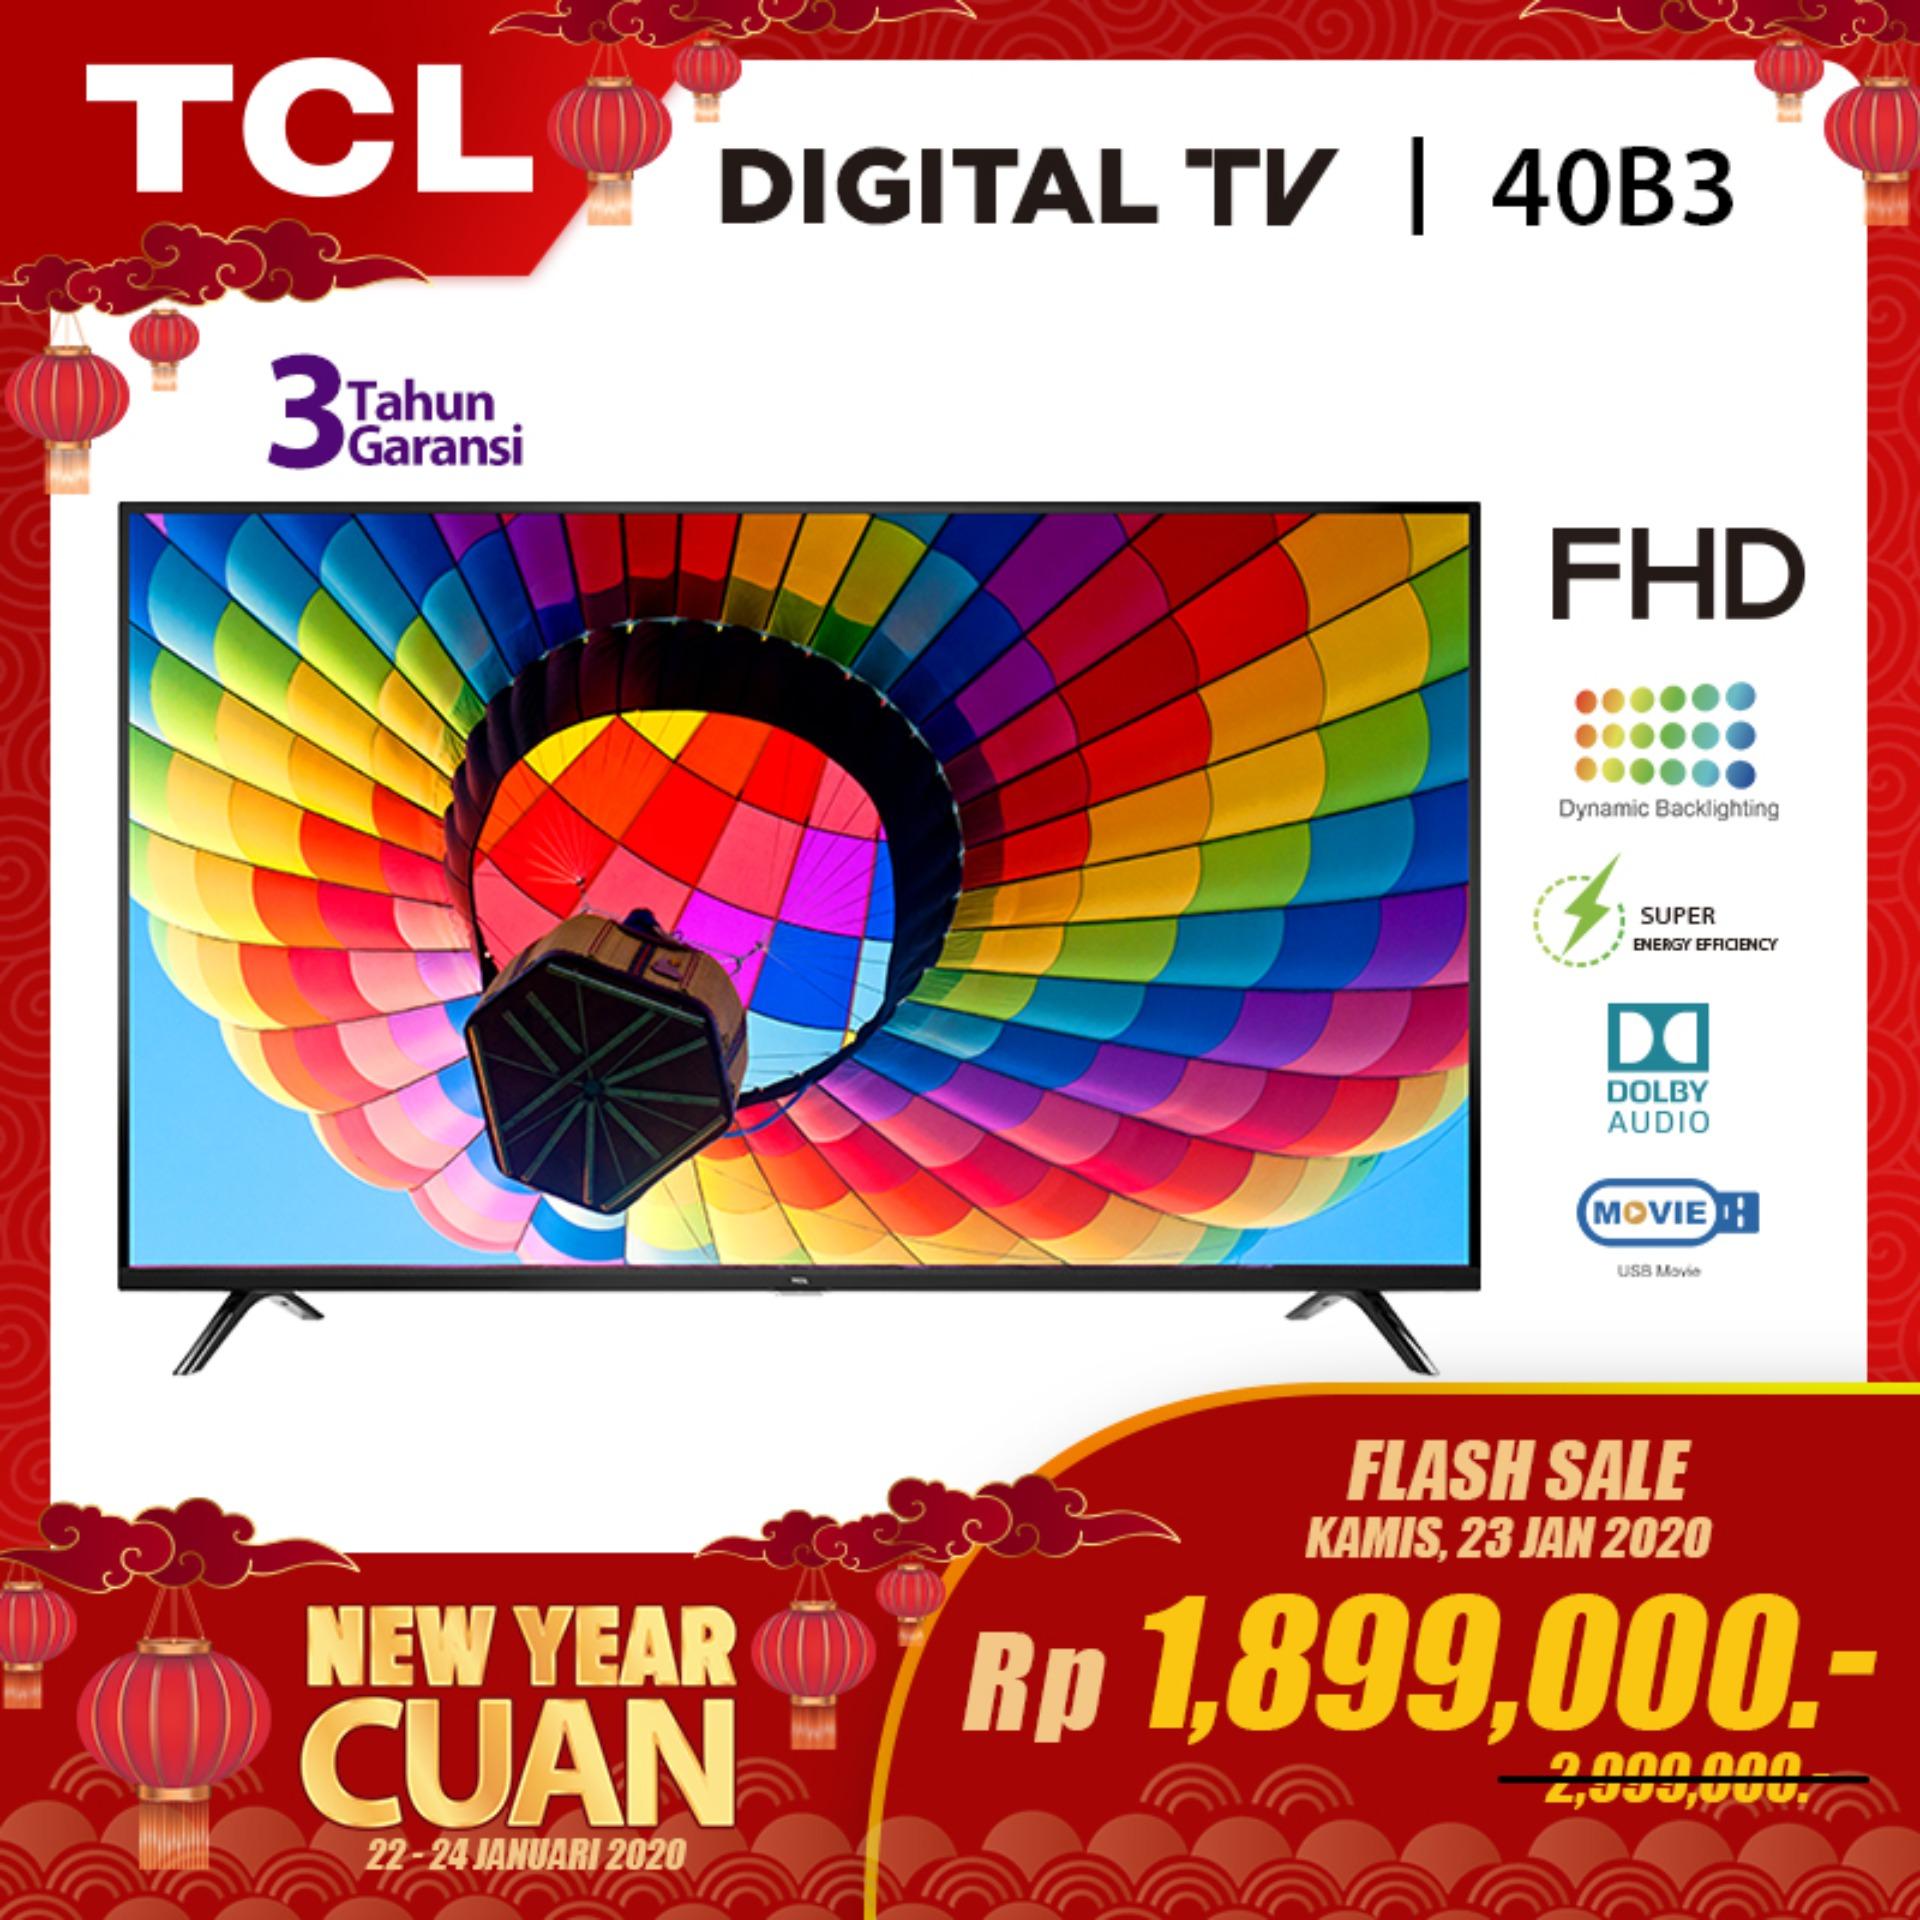 [CUAN NEW YEAR 22 - 24 JAN 2020] TCL LED TV 40 inch - Full HD Digital TV - HDMI/USB - Headphone (model 40B3)